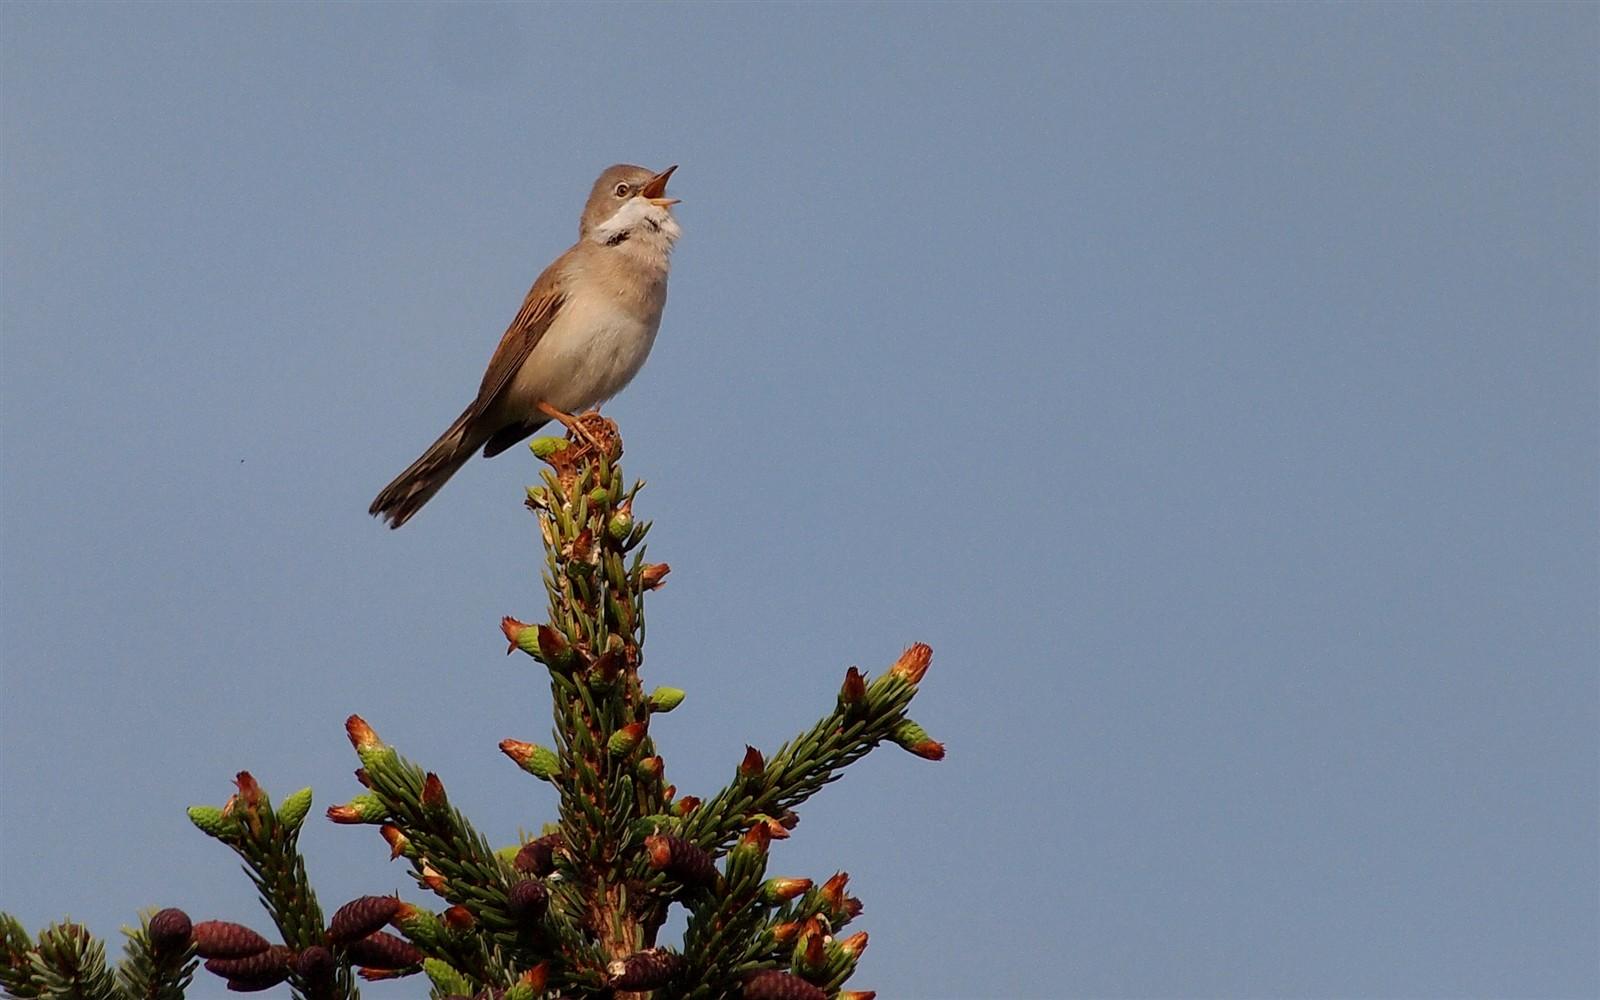 Singender vogel anderl galleries digital photography